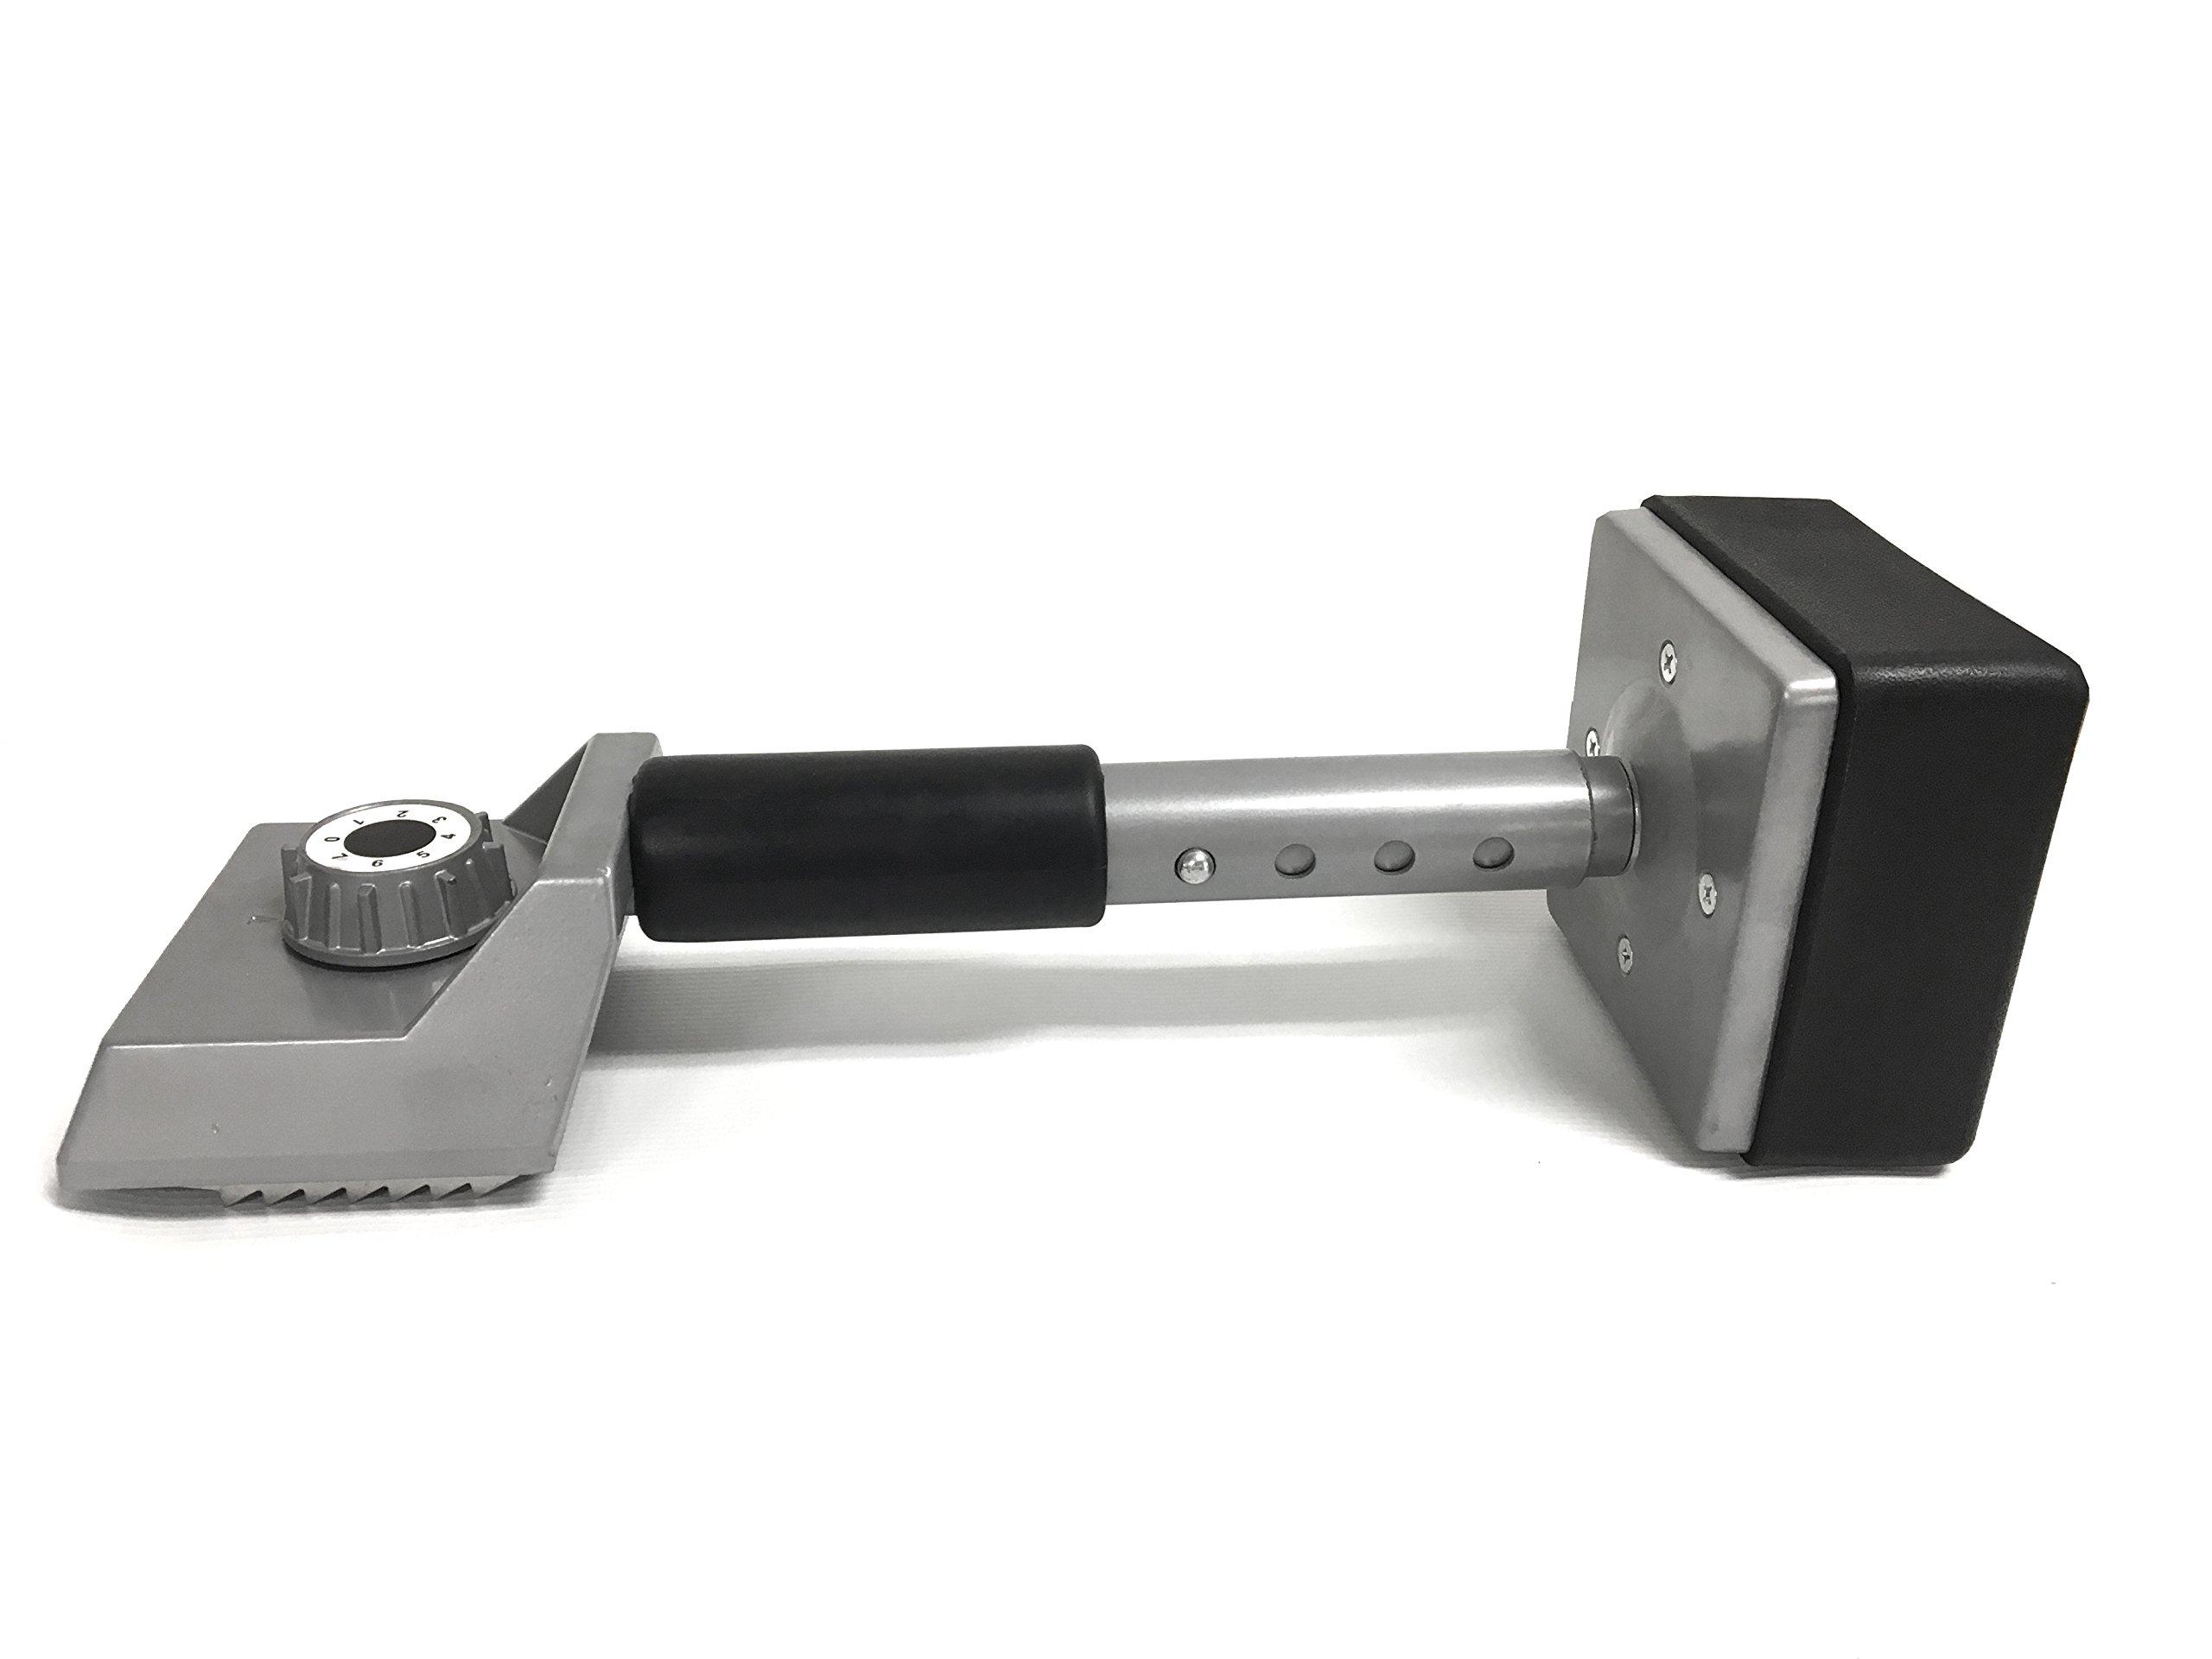 MaxWorks 80742 Carpet Stretcher Knee Kicker with Telescoping Handle, Regular, Black